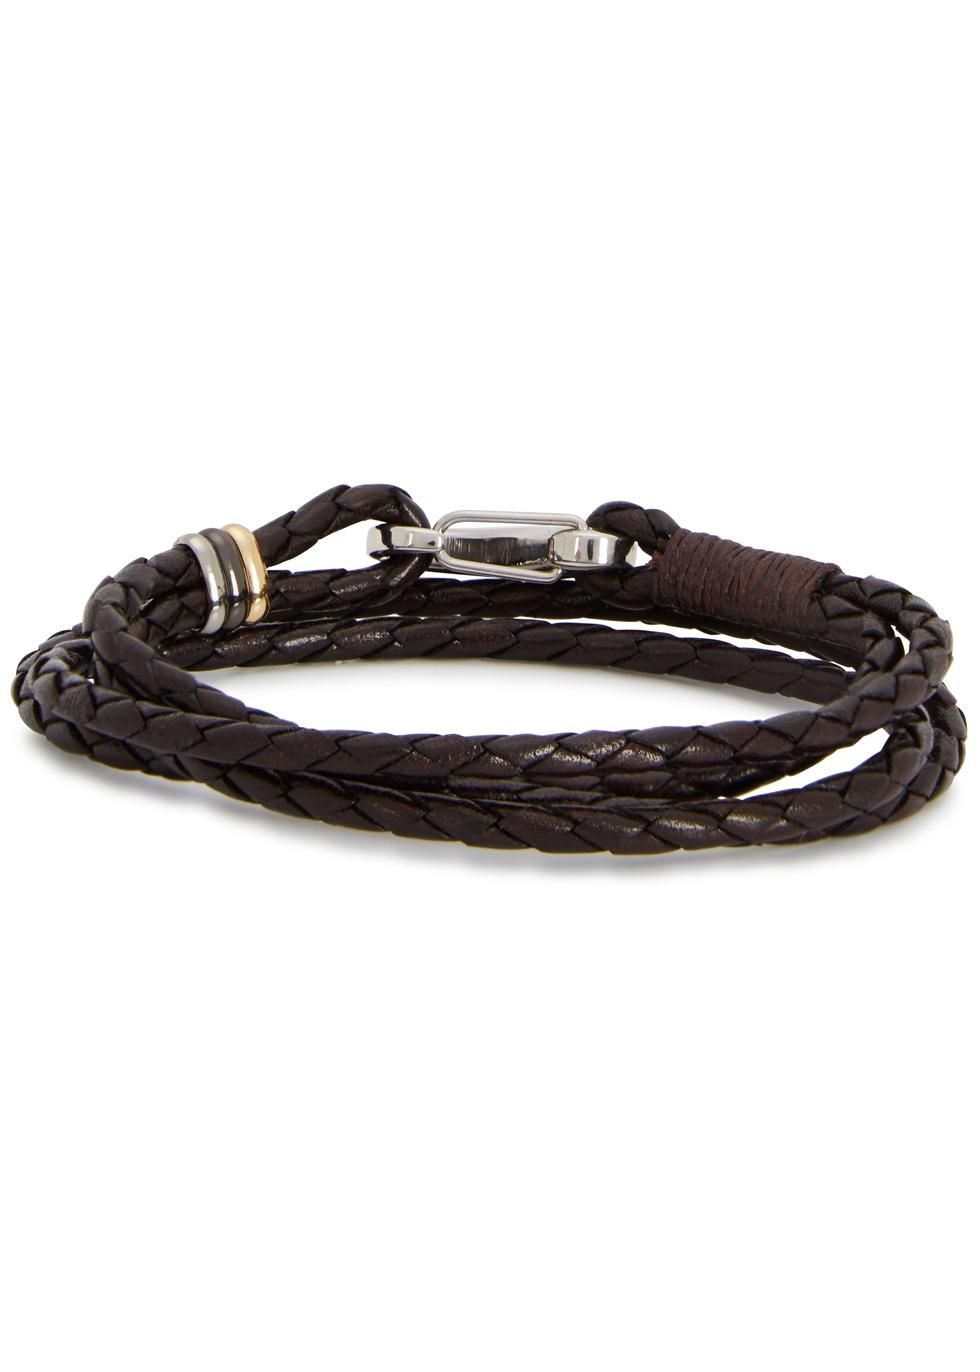 0694f72a911eae Men s Designer Jewellery and Watches - Harvey Nichols